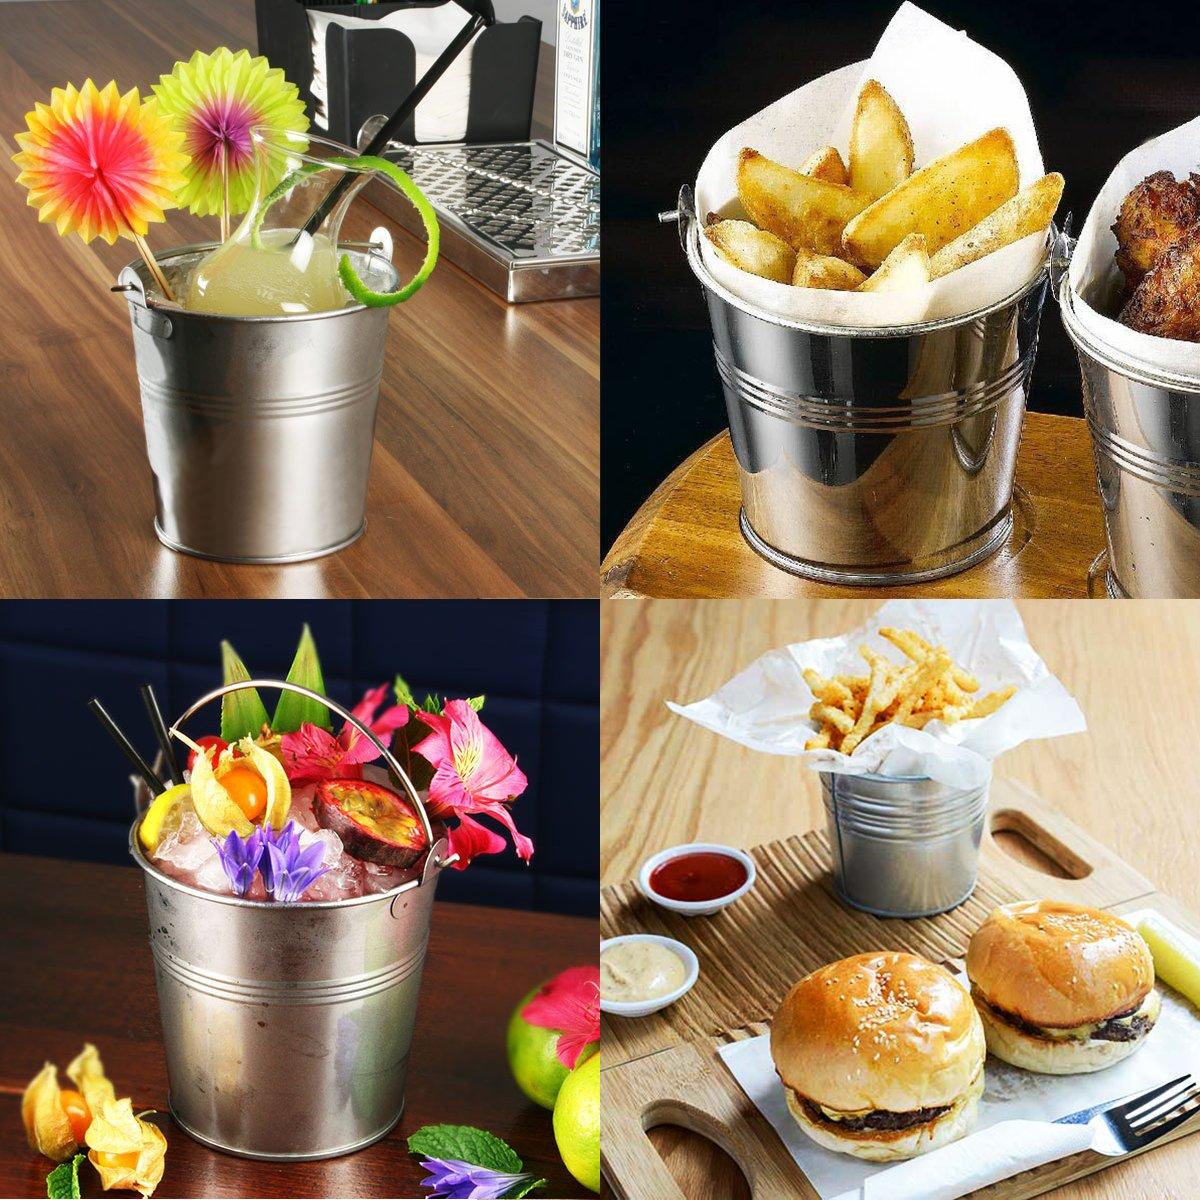 OUNONA Mini Metal Bucket Set of 6 /Mini Food Containers/Succulent Wedding Buckets 10.5x7.2x10.5cm by OUNONA (Image #6)